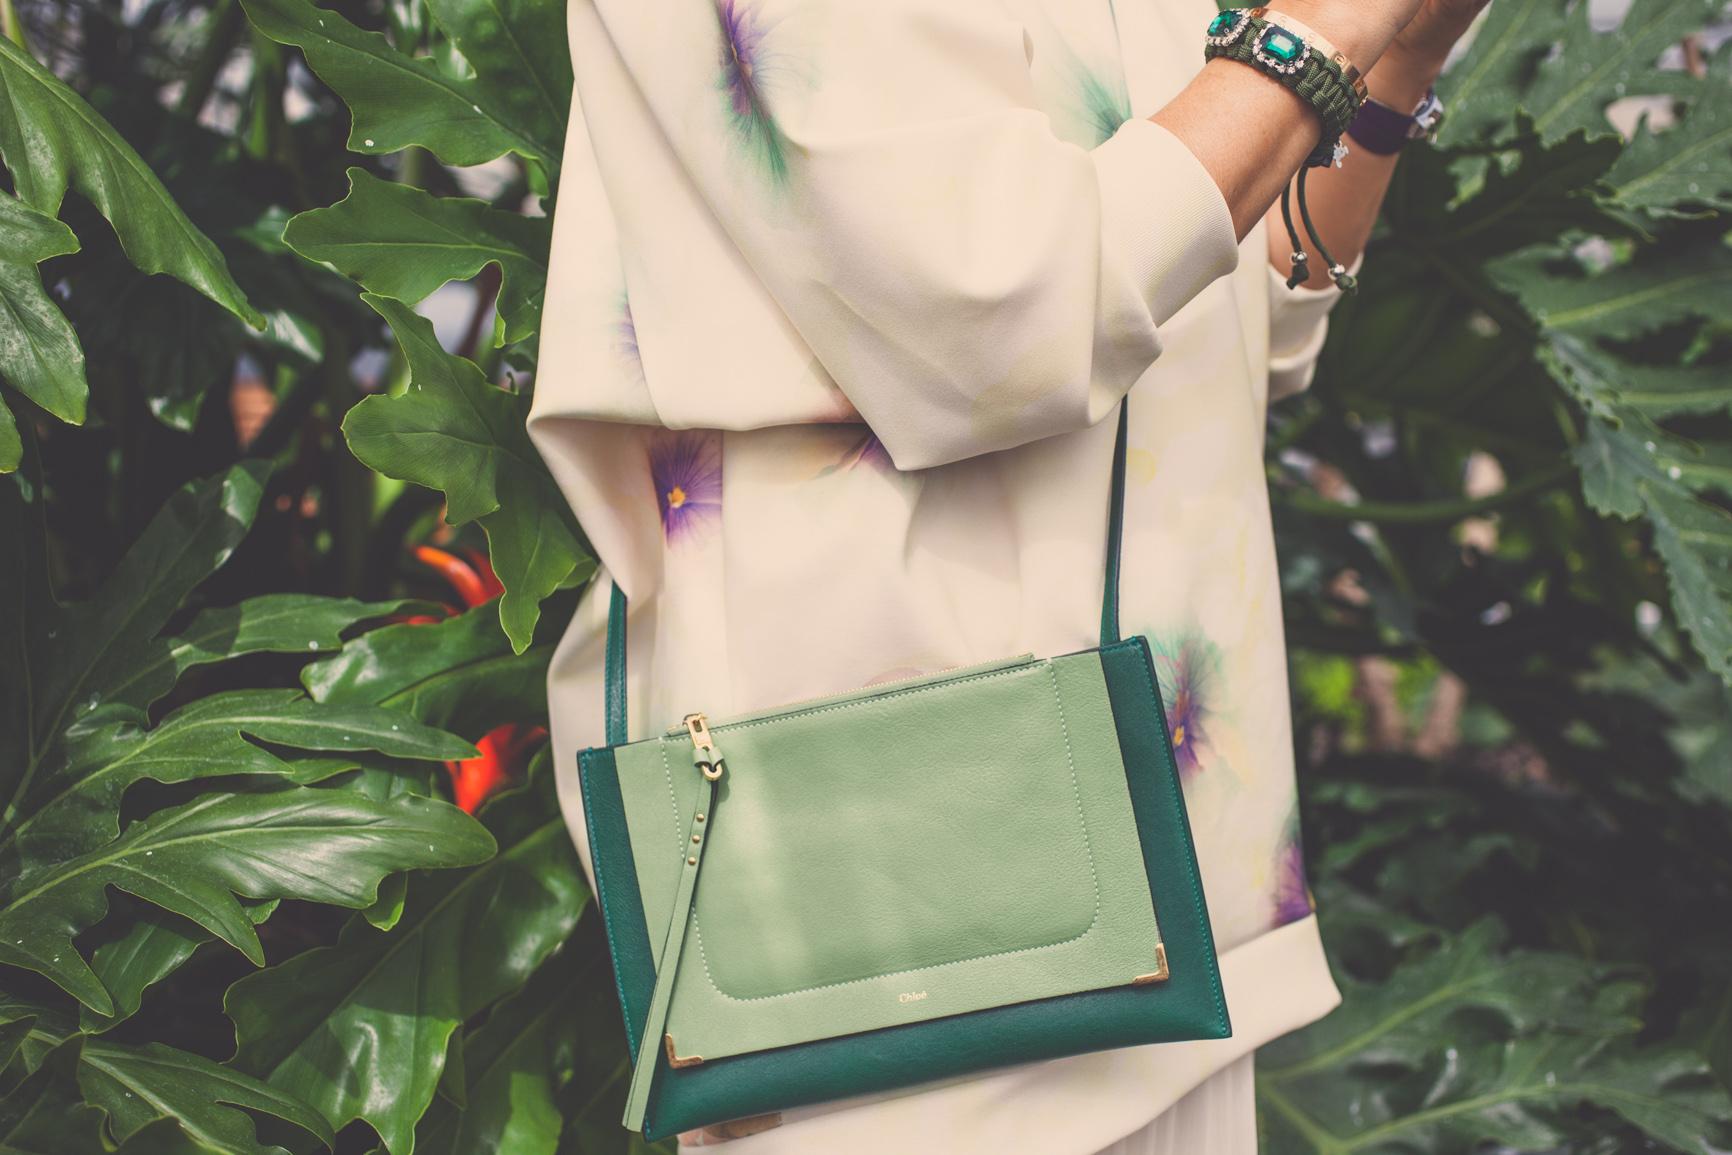 mademoiselle jules greenhouse chloe purse green bag fashion trend blog